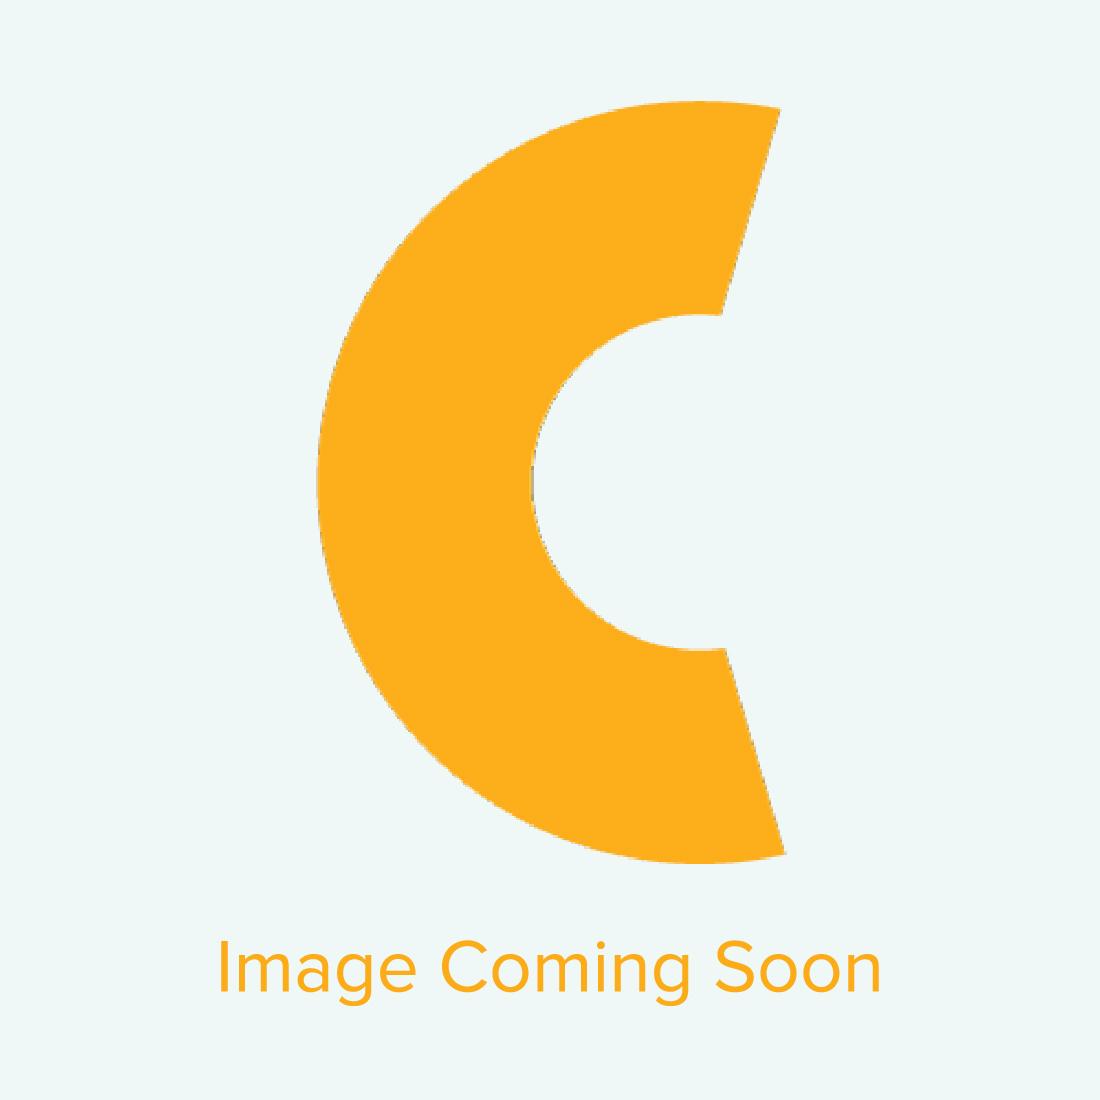 "Heat Transfer Metallic Foil - 12.5"" x 100 feet - Almond - CLEARANCE"